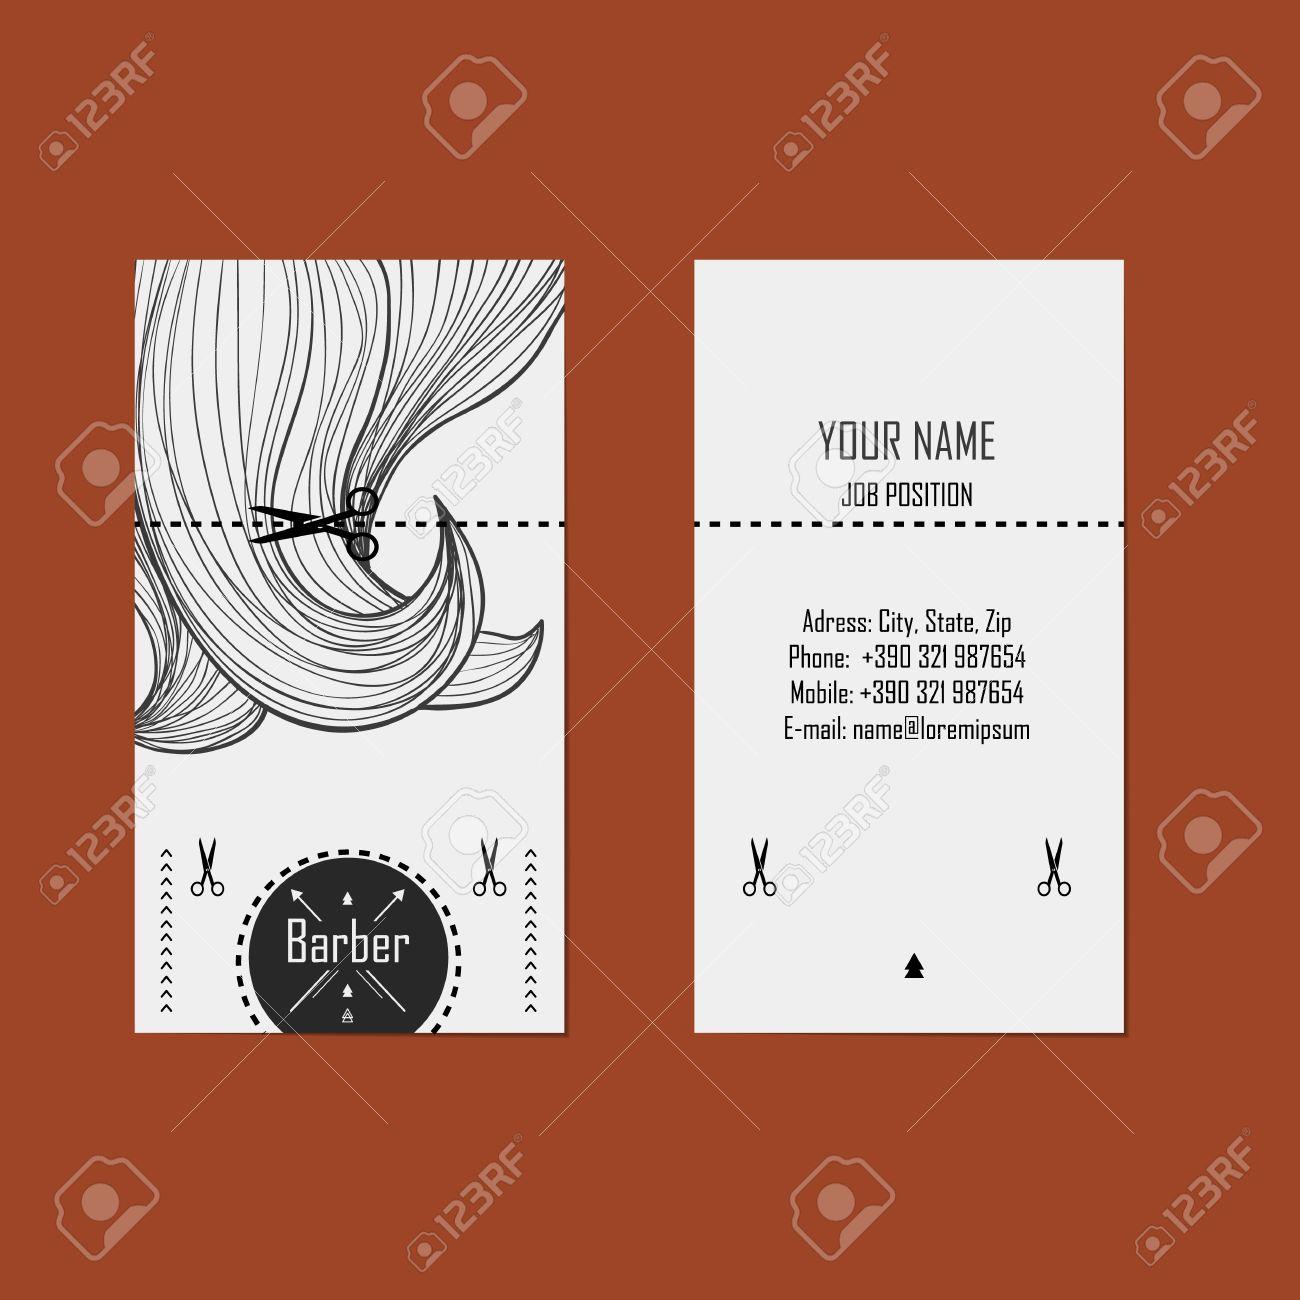 Alternative design business cards for hairdresser barber royalty alternative design business cards for hairdresser barber stock vector 28507546 colourmoves